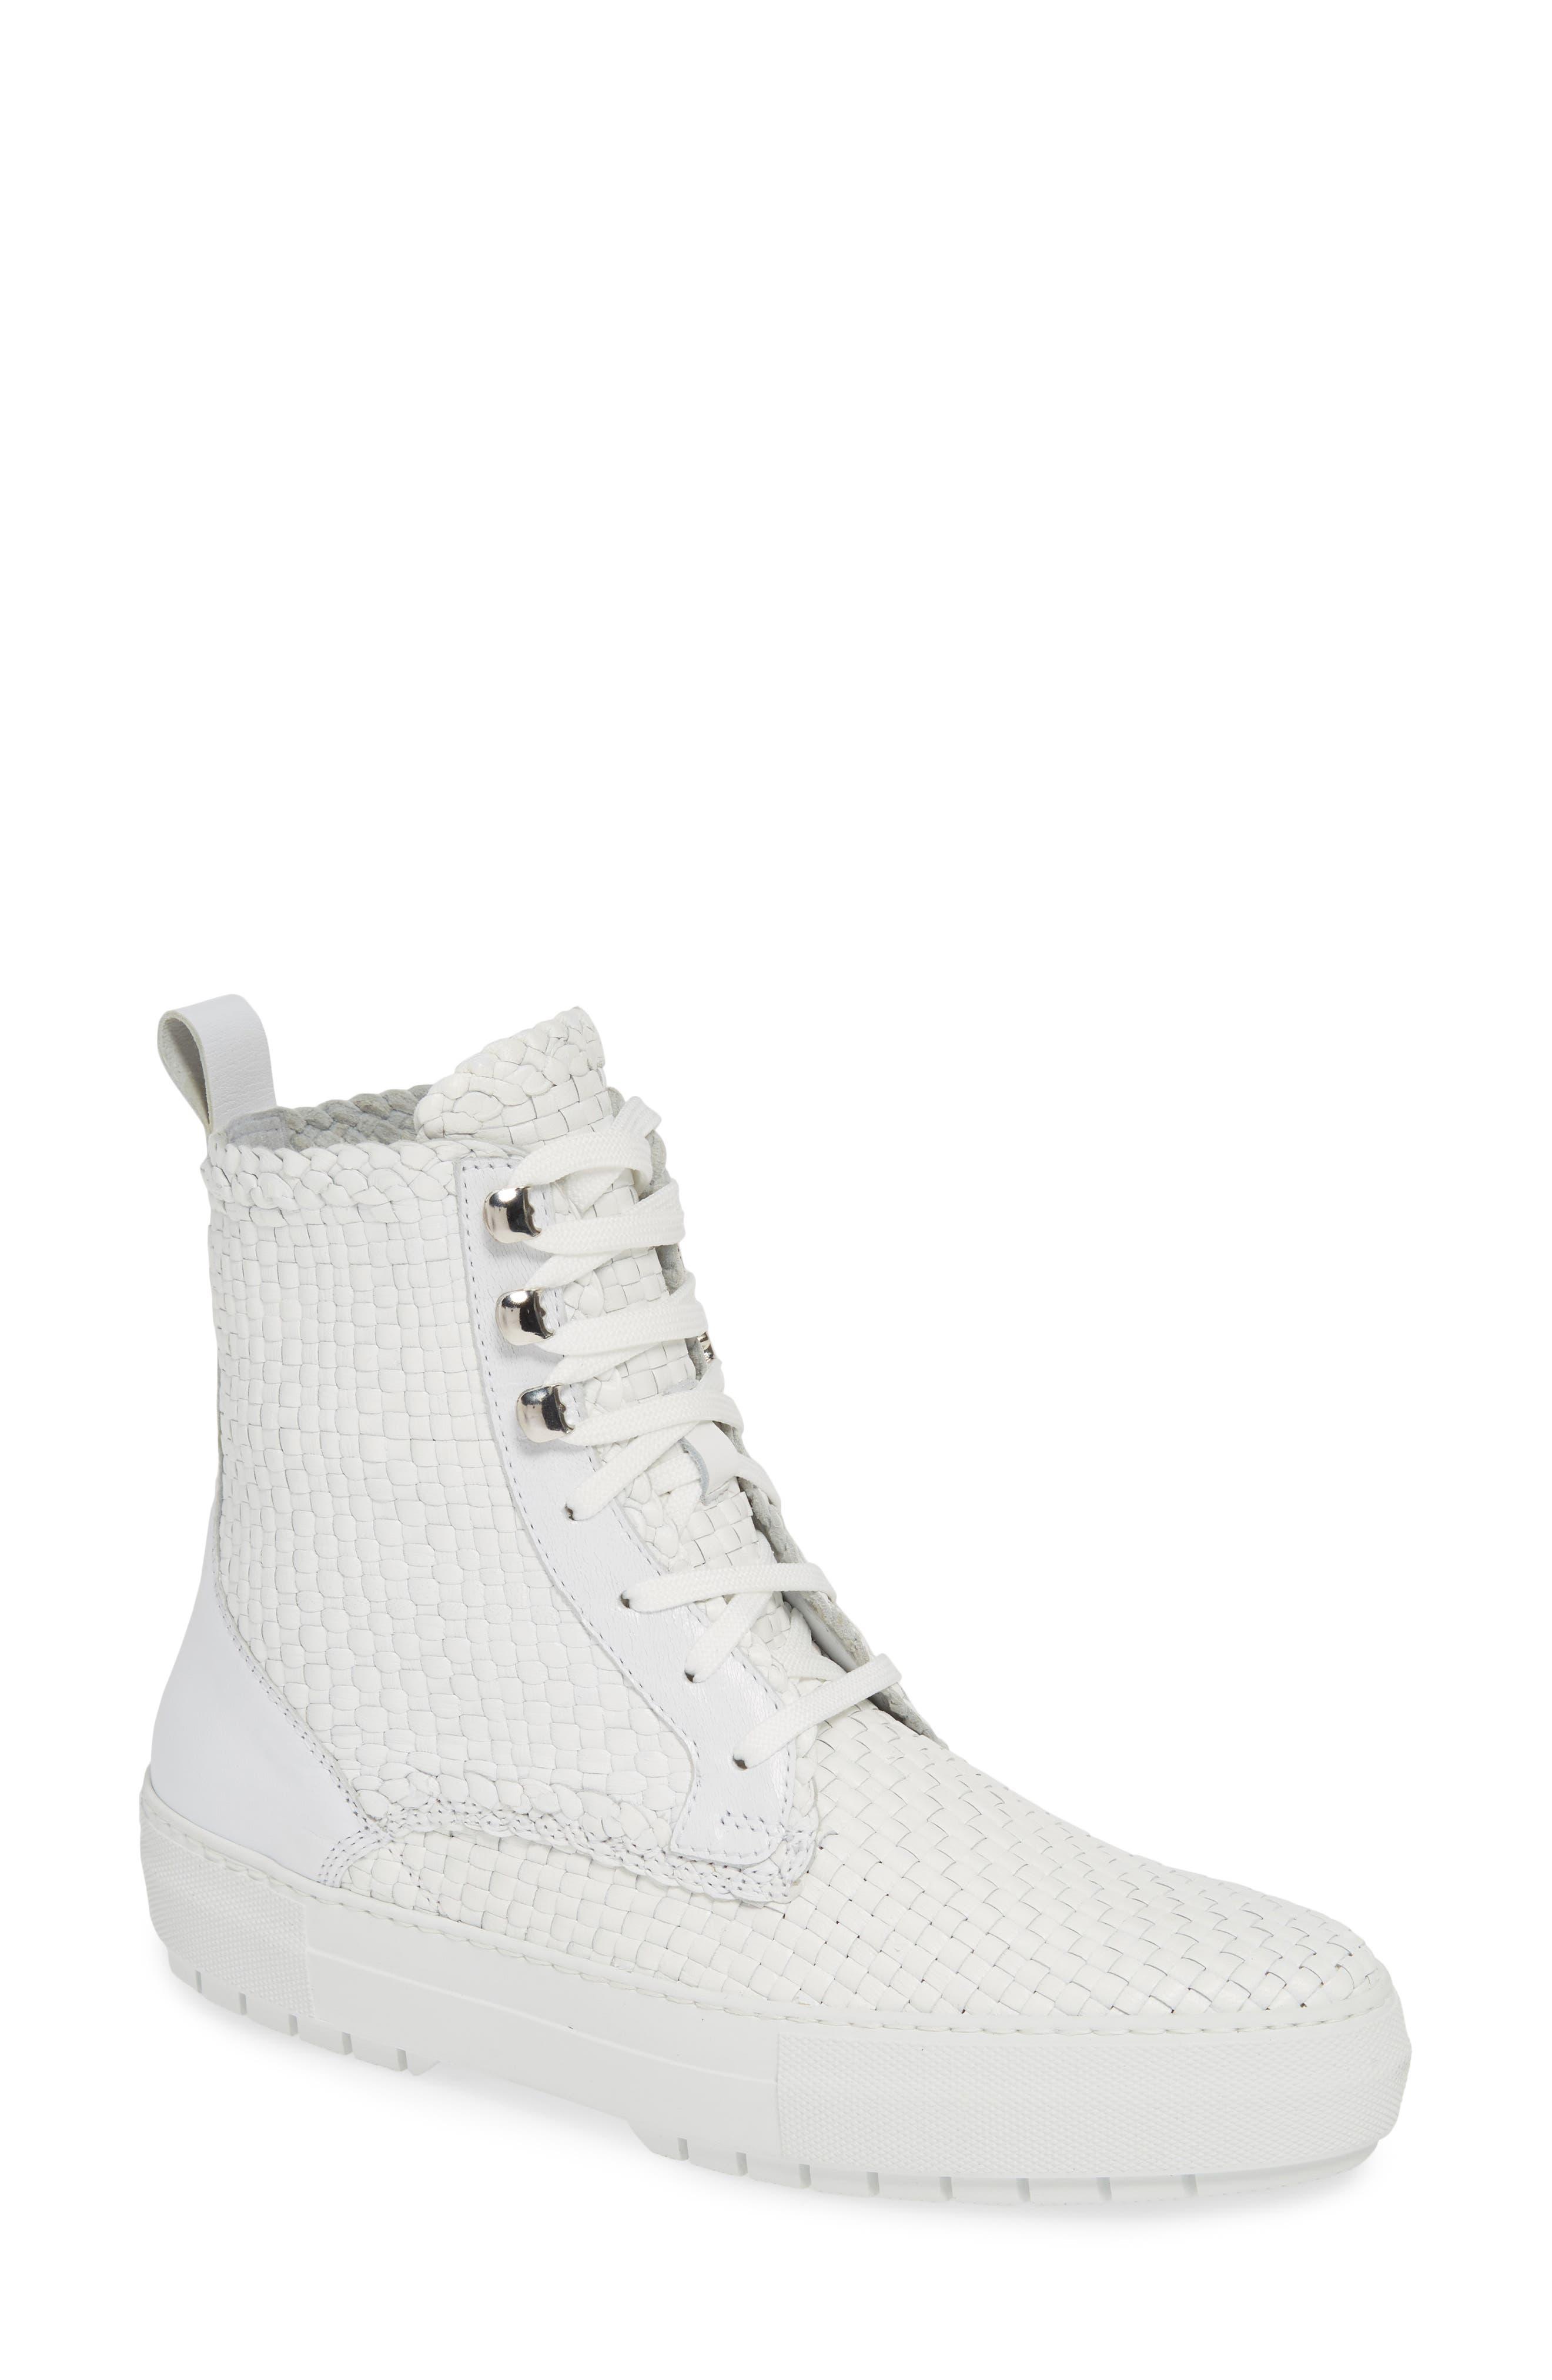 Aquatalia Tess Woven Boot, White